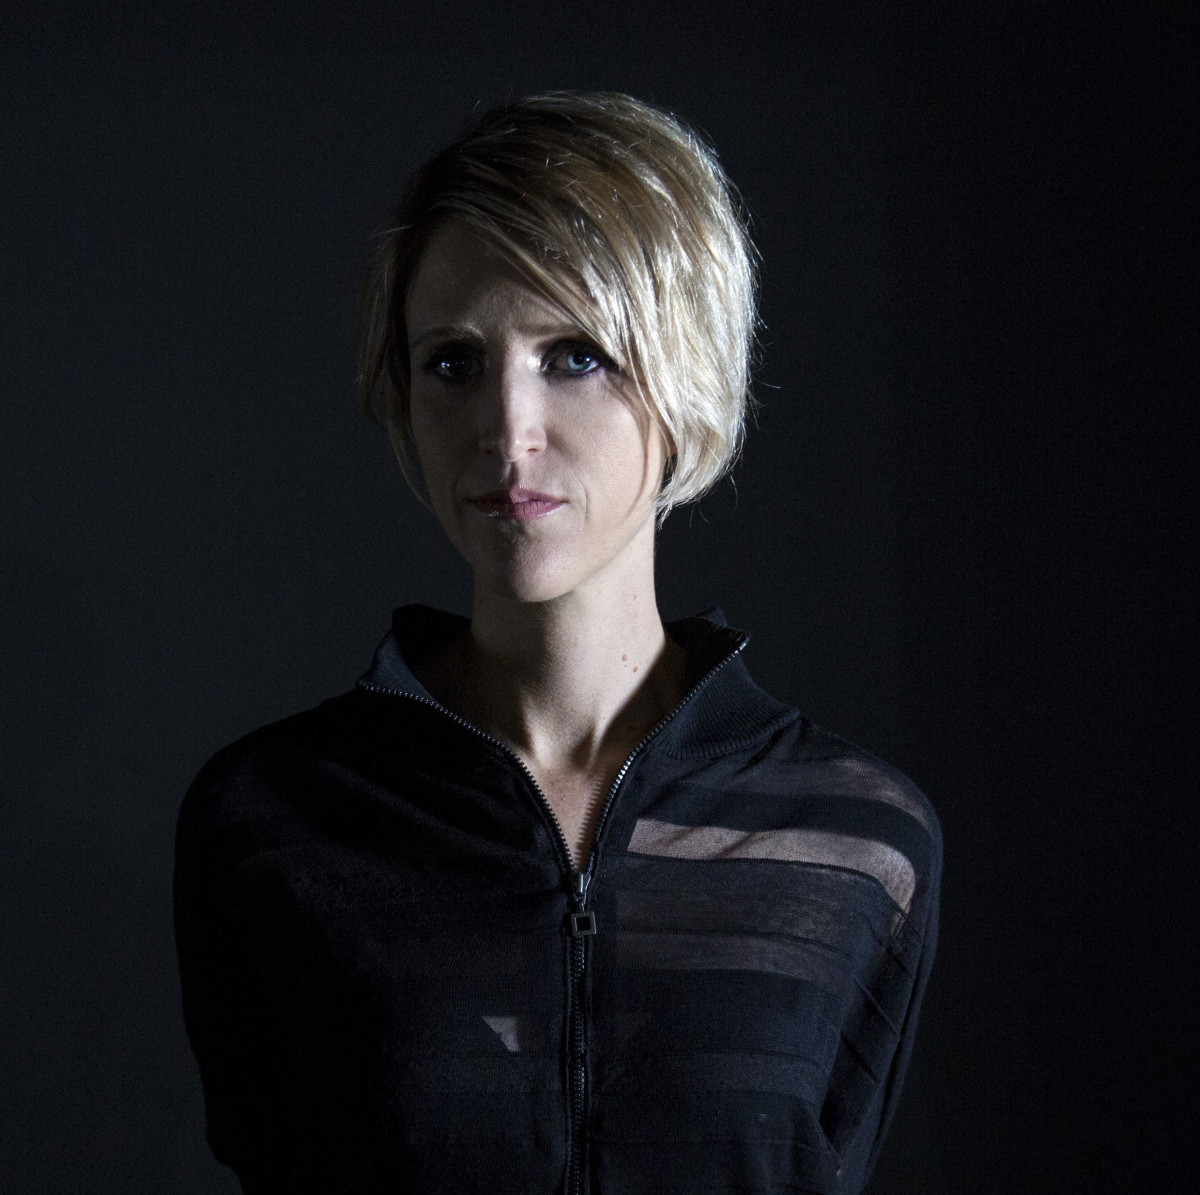 Kate Simko